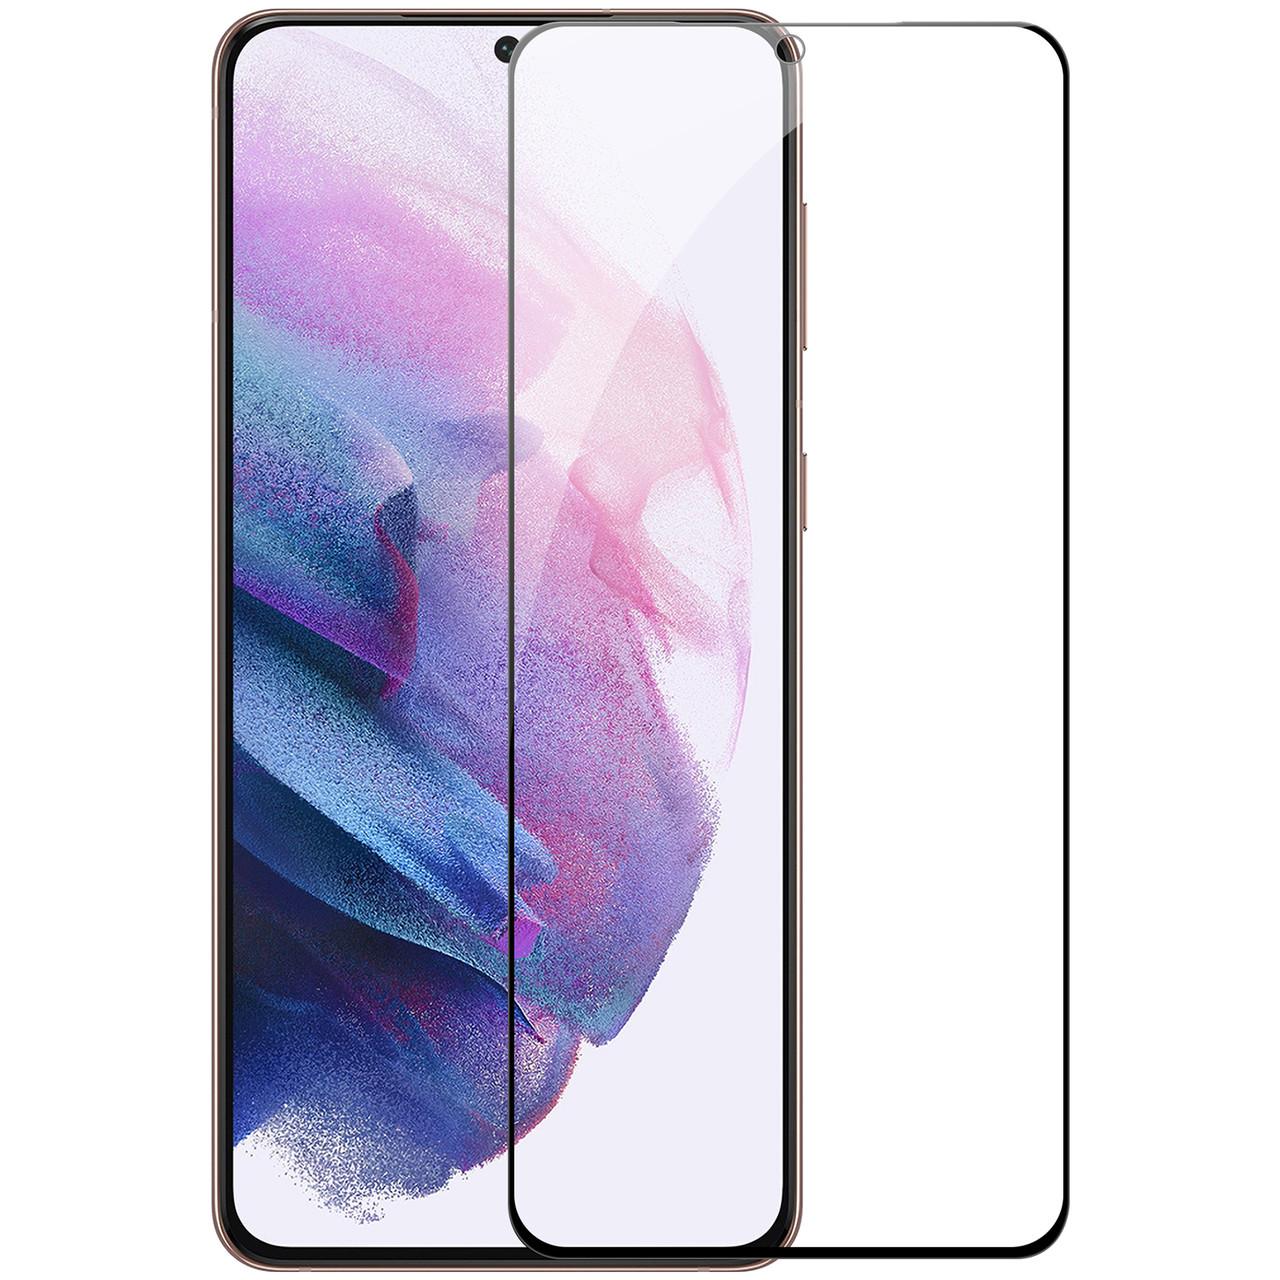 Захисне скло Nillkin для Samsung Galaxy S21 (CP + PRO) Tempered Glass Black з олеофобним покриттям